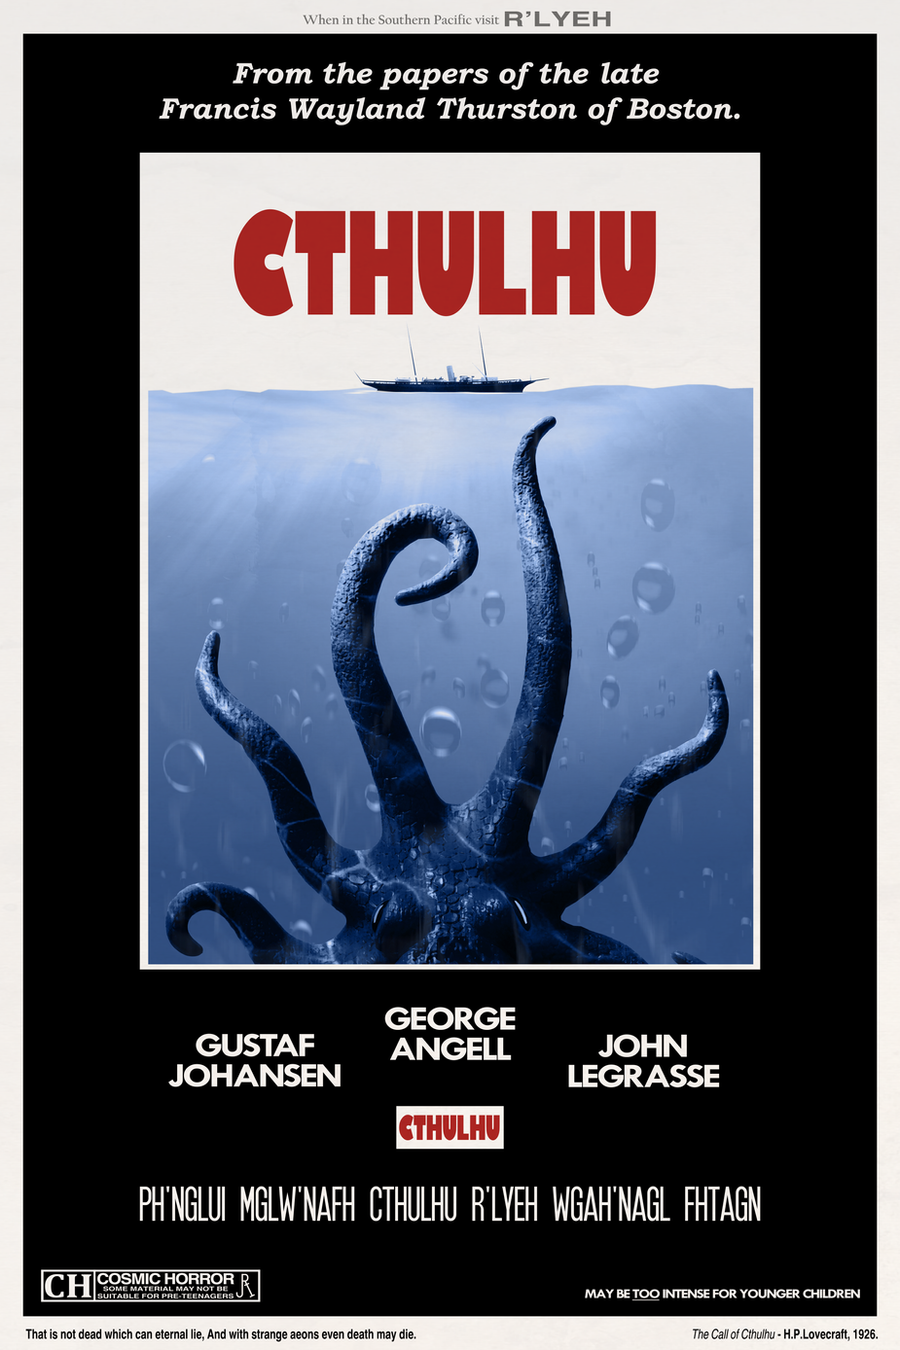 Cthulhu by DrFaustusAU